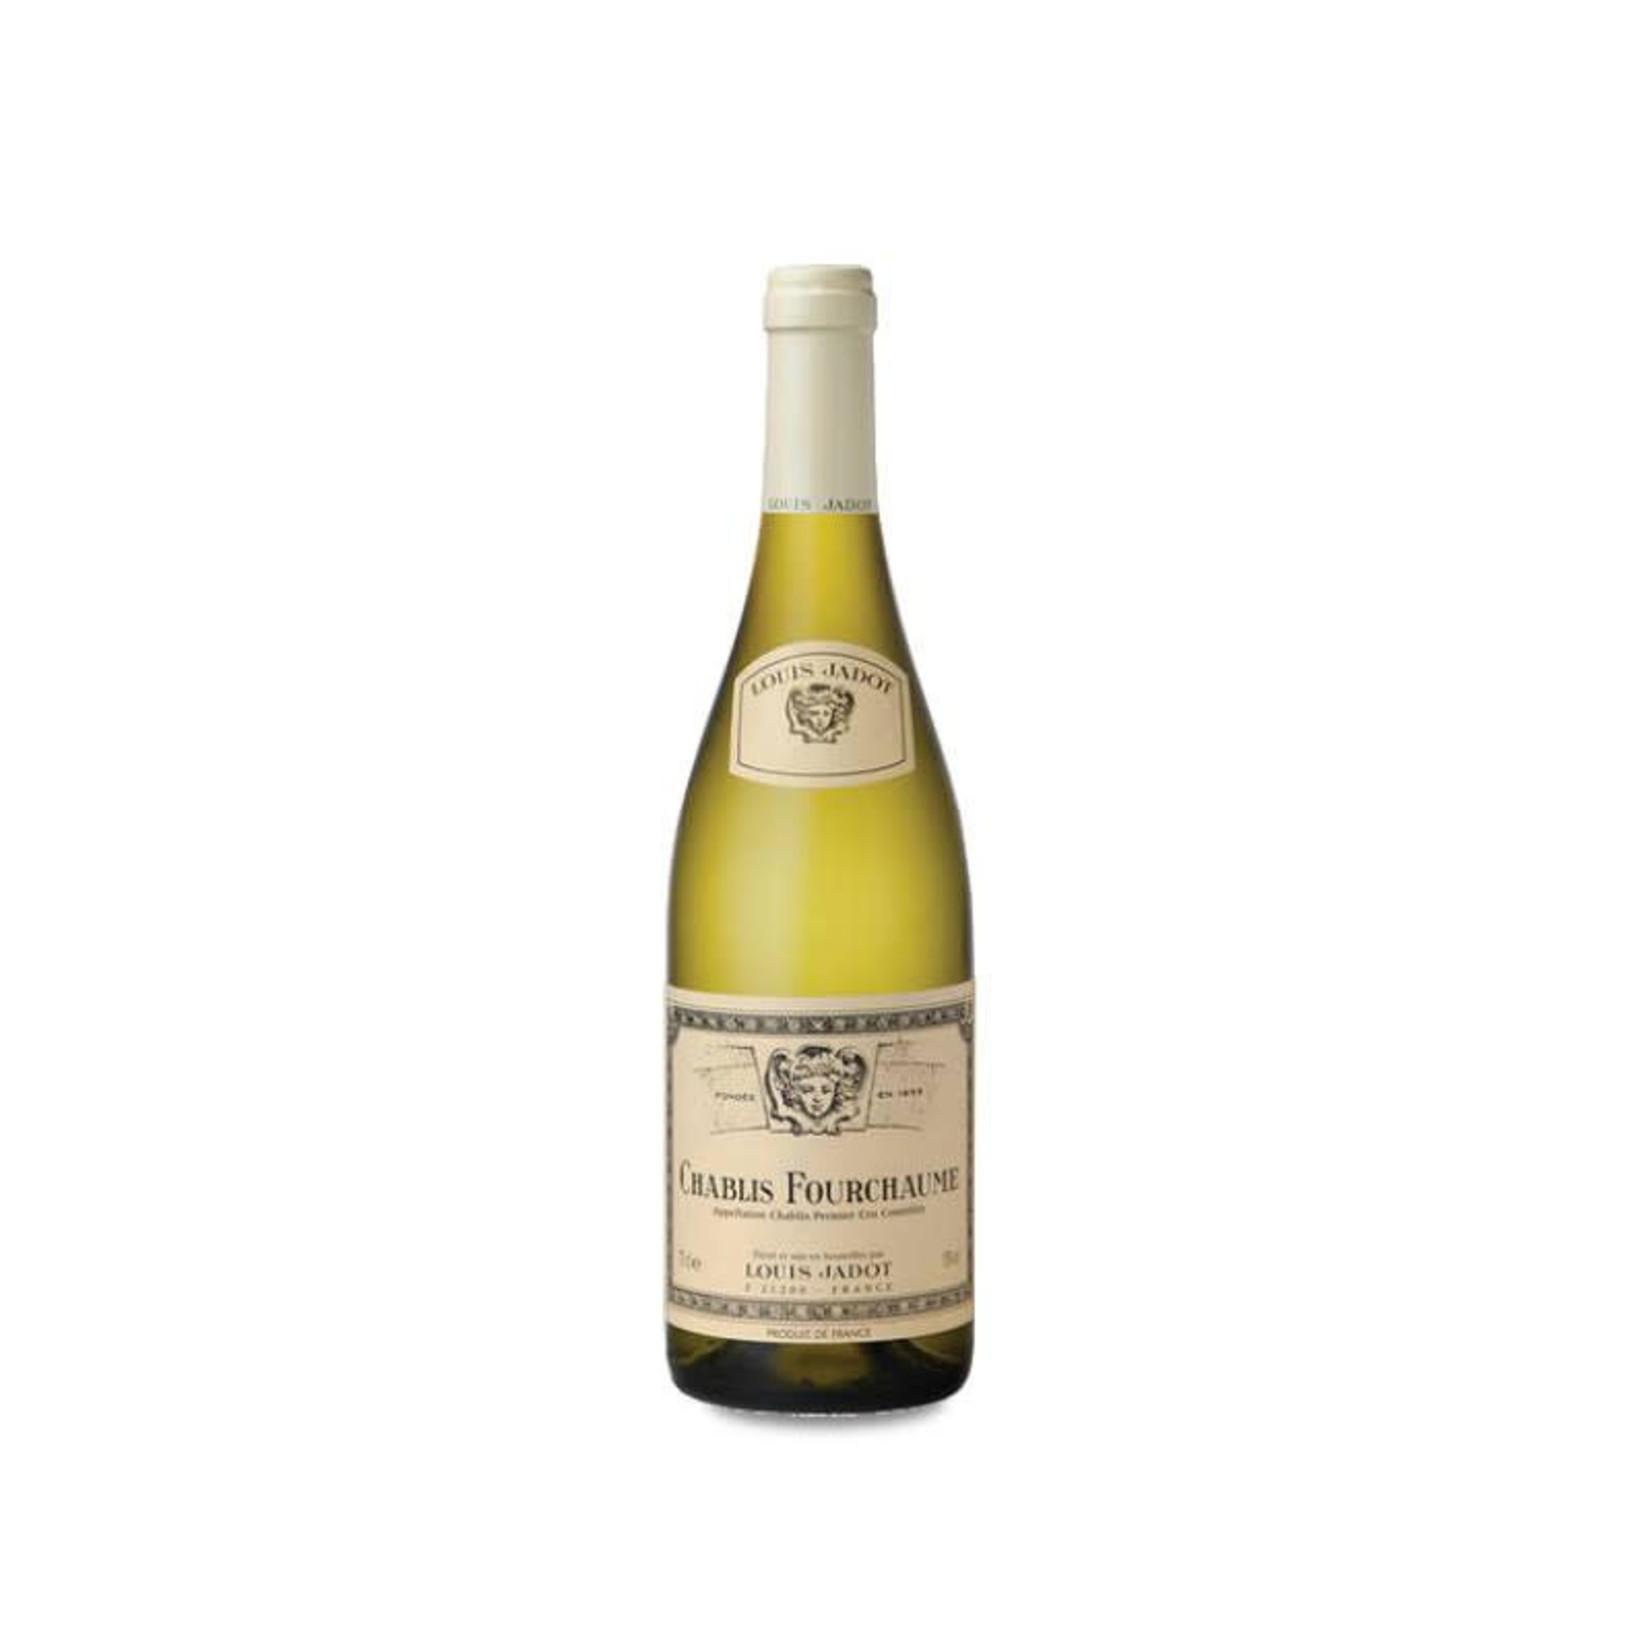 Wine Chablis 1er Cru Fourchaume Louis Jadot 2019